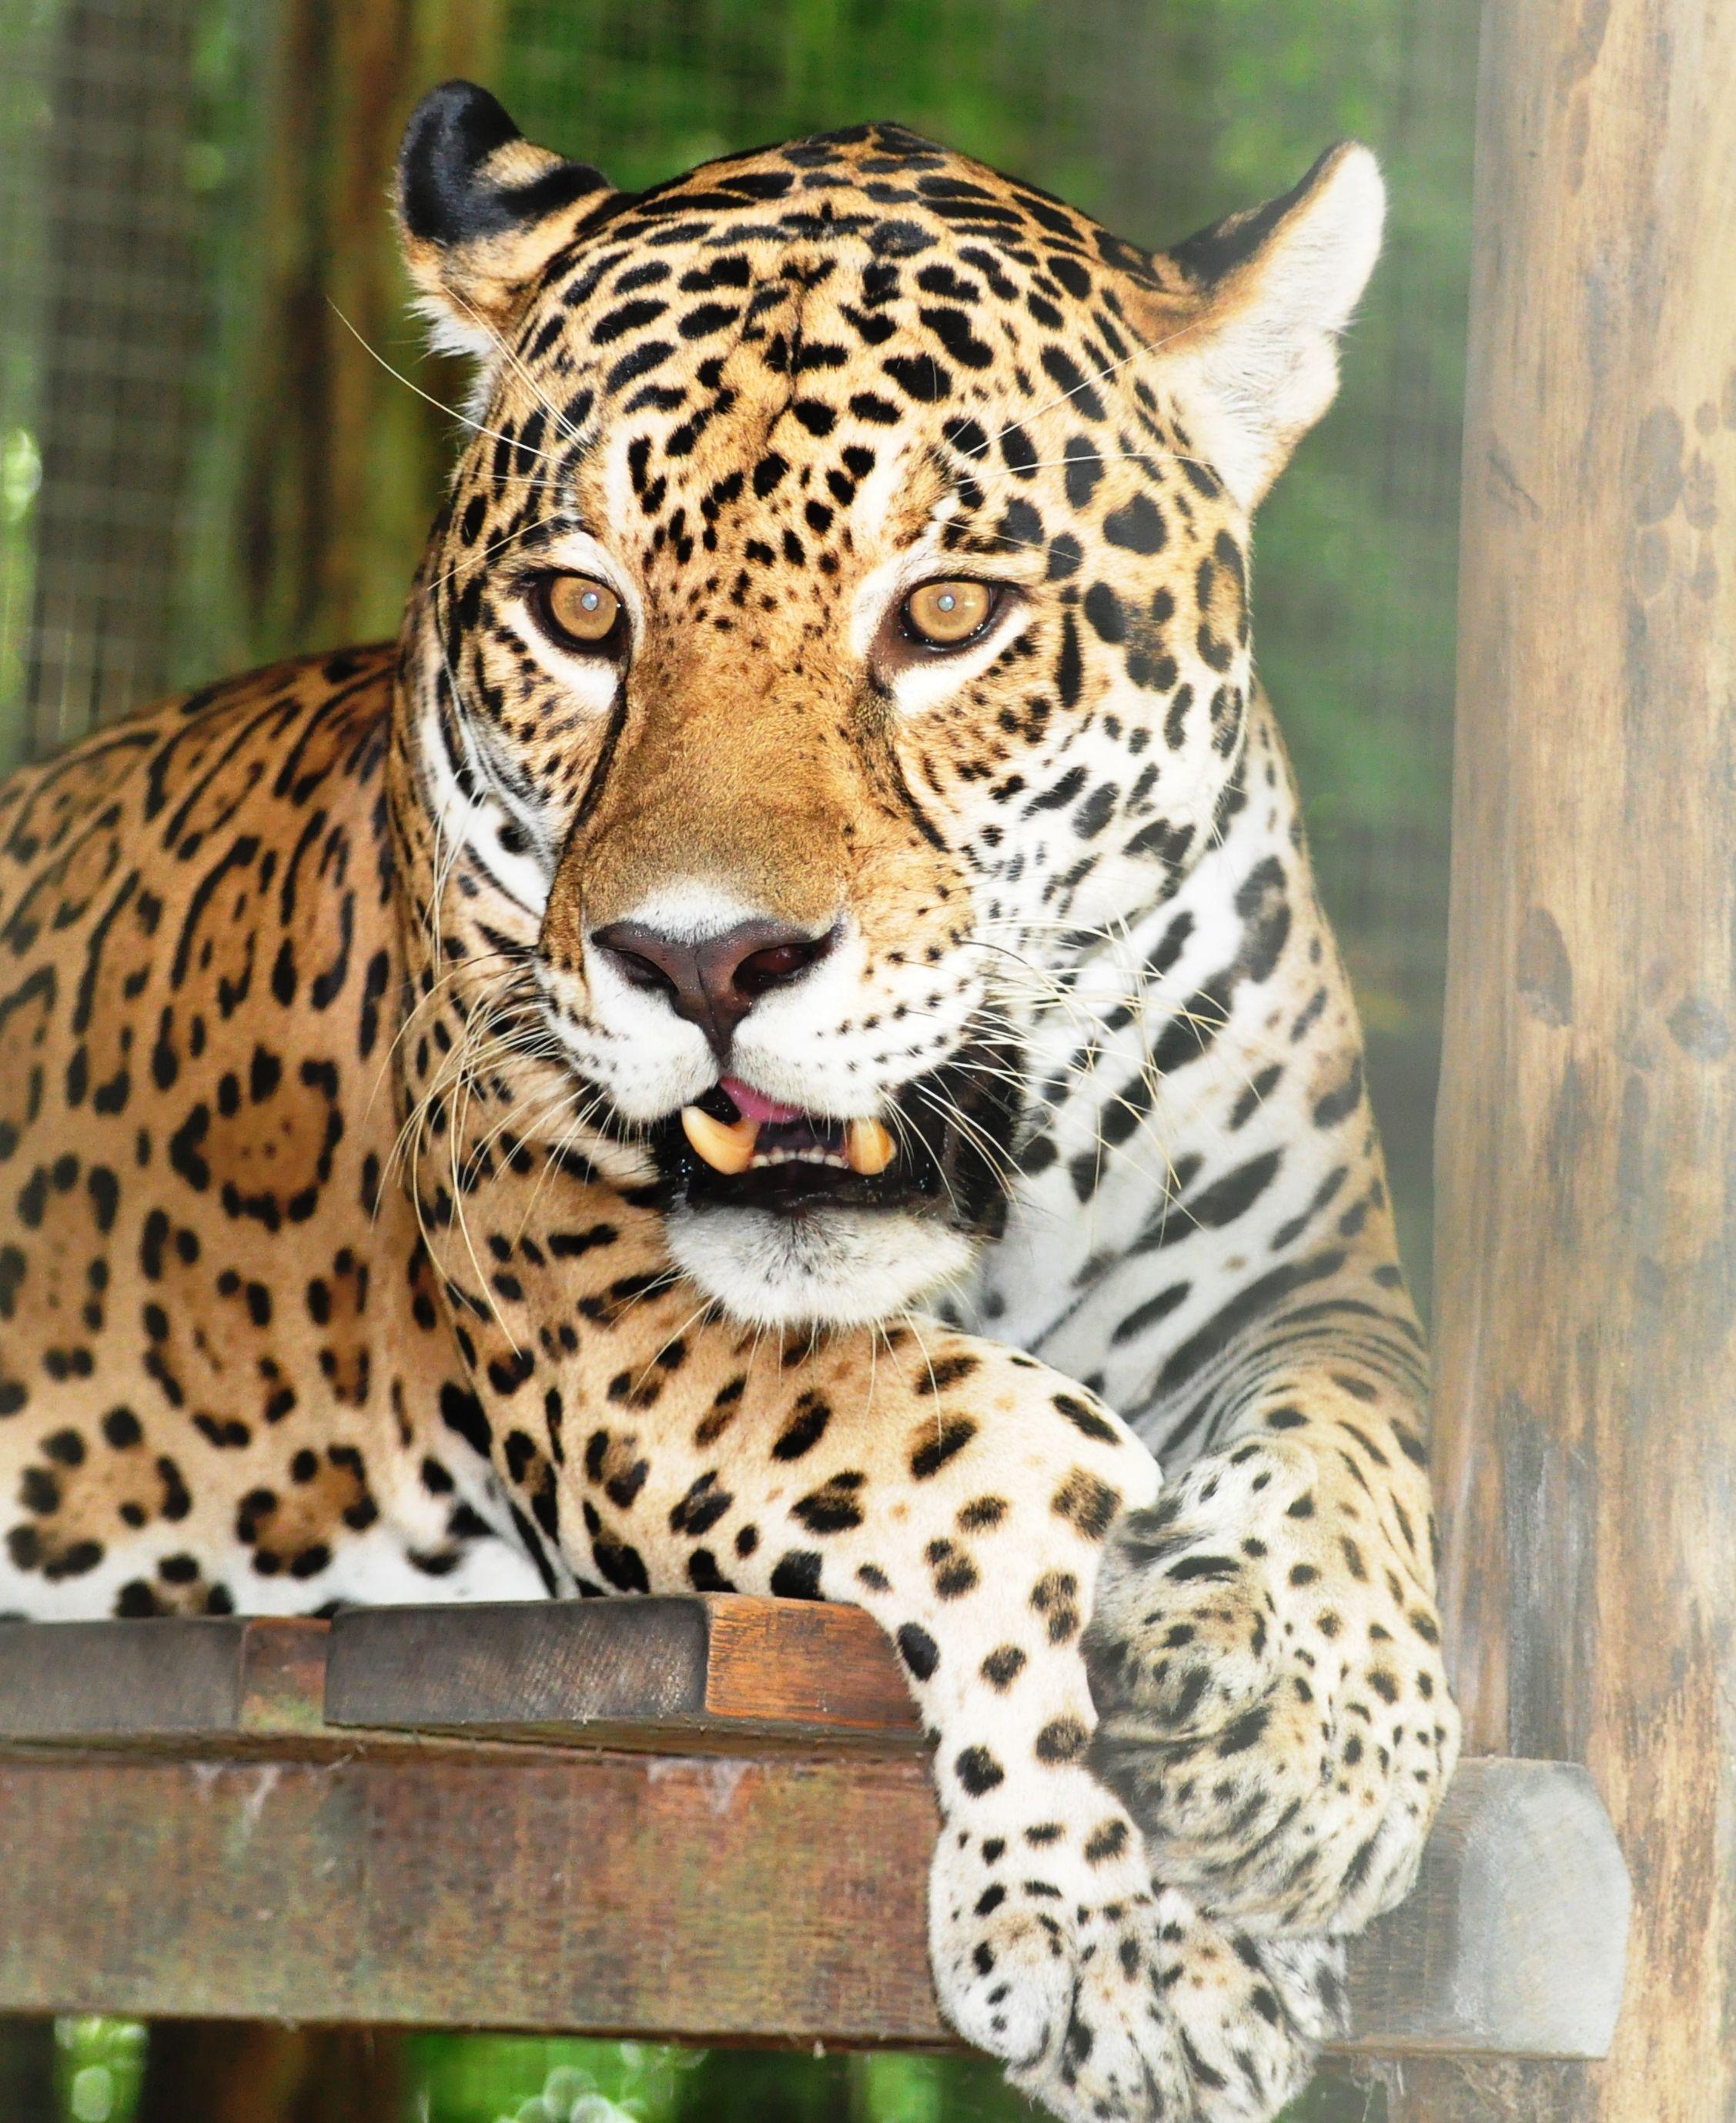 Jaguar in the Amazon Rainforest Amazon rainforest, Big